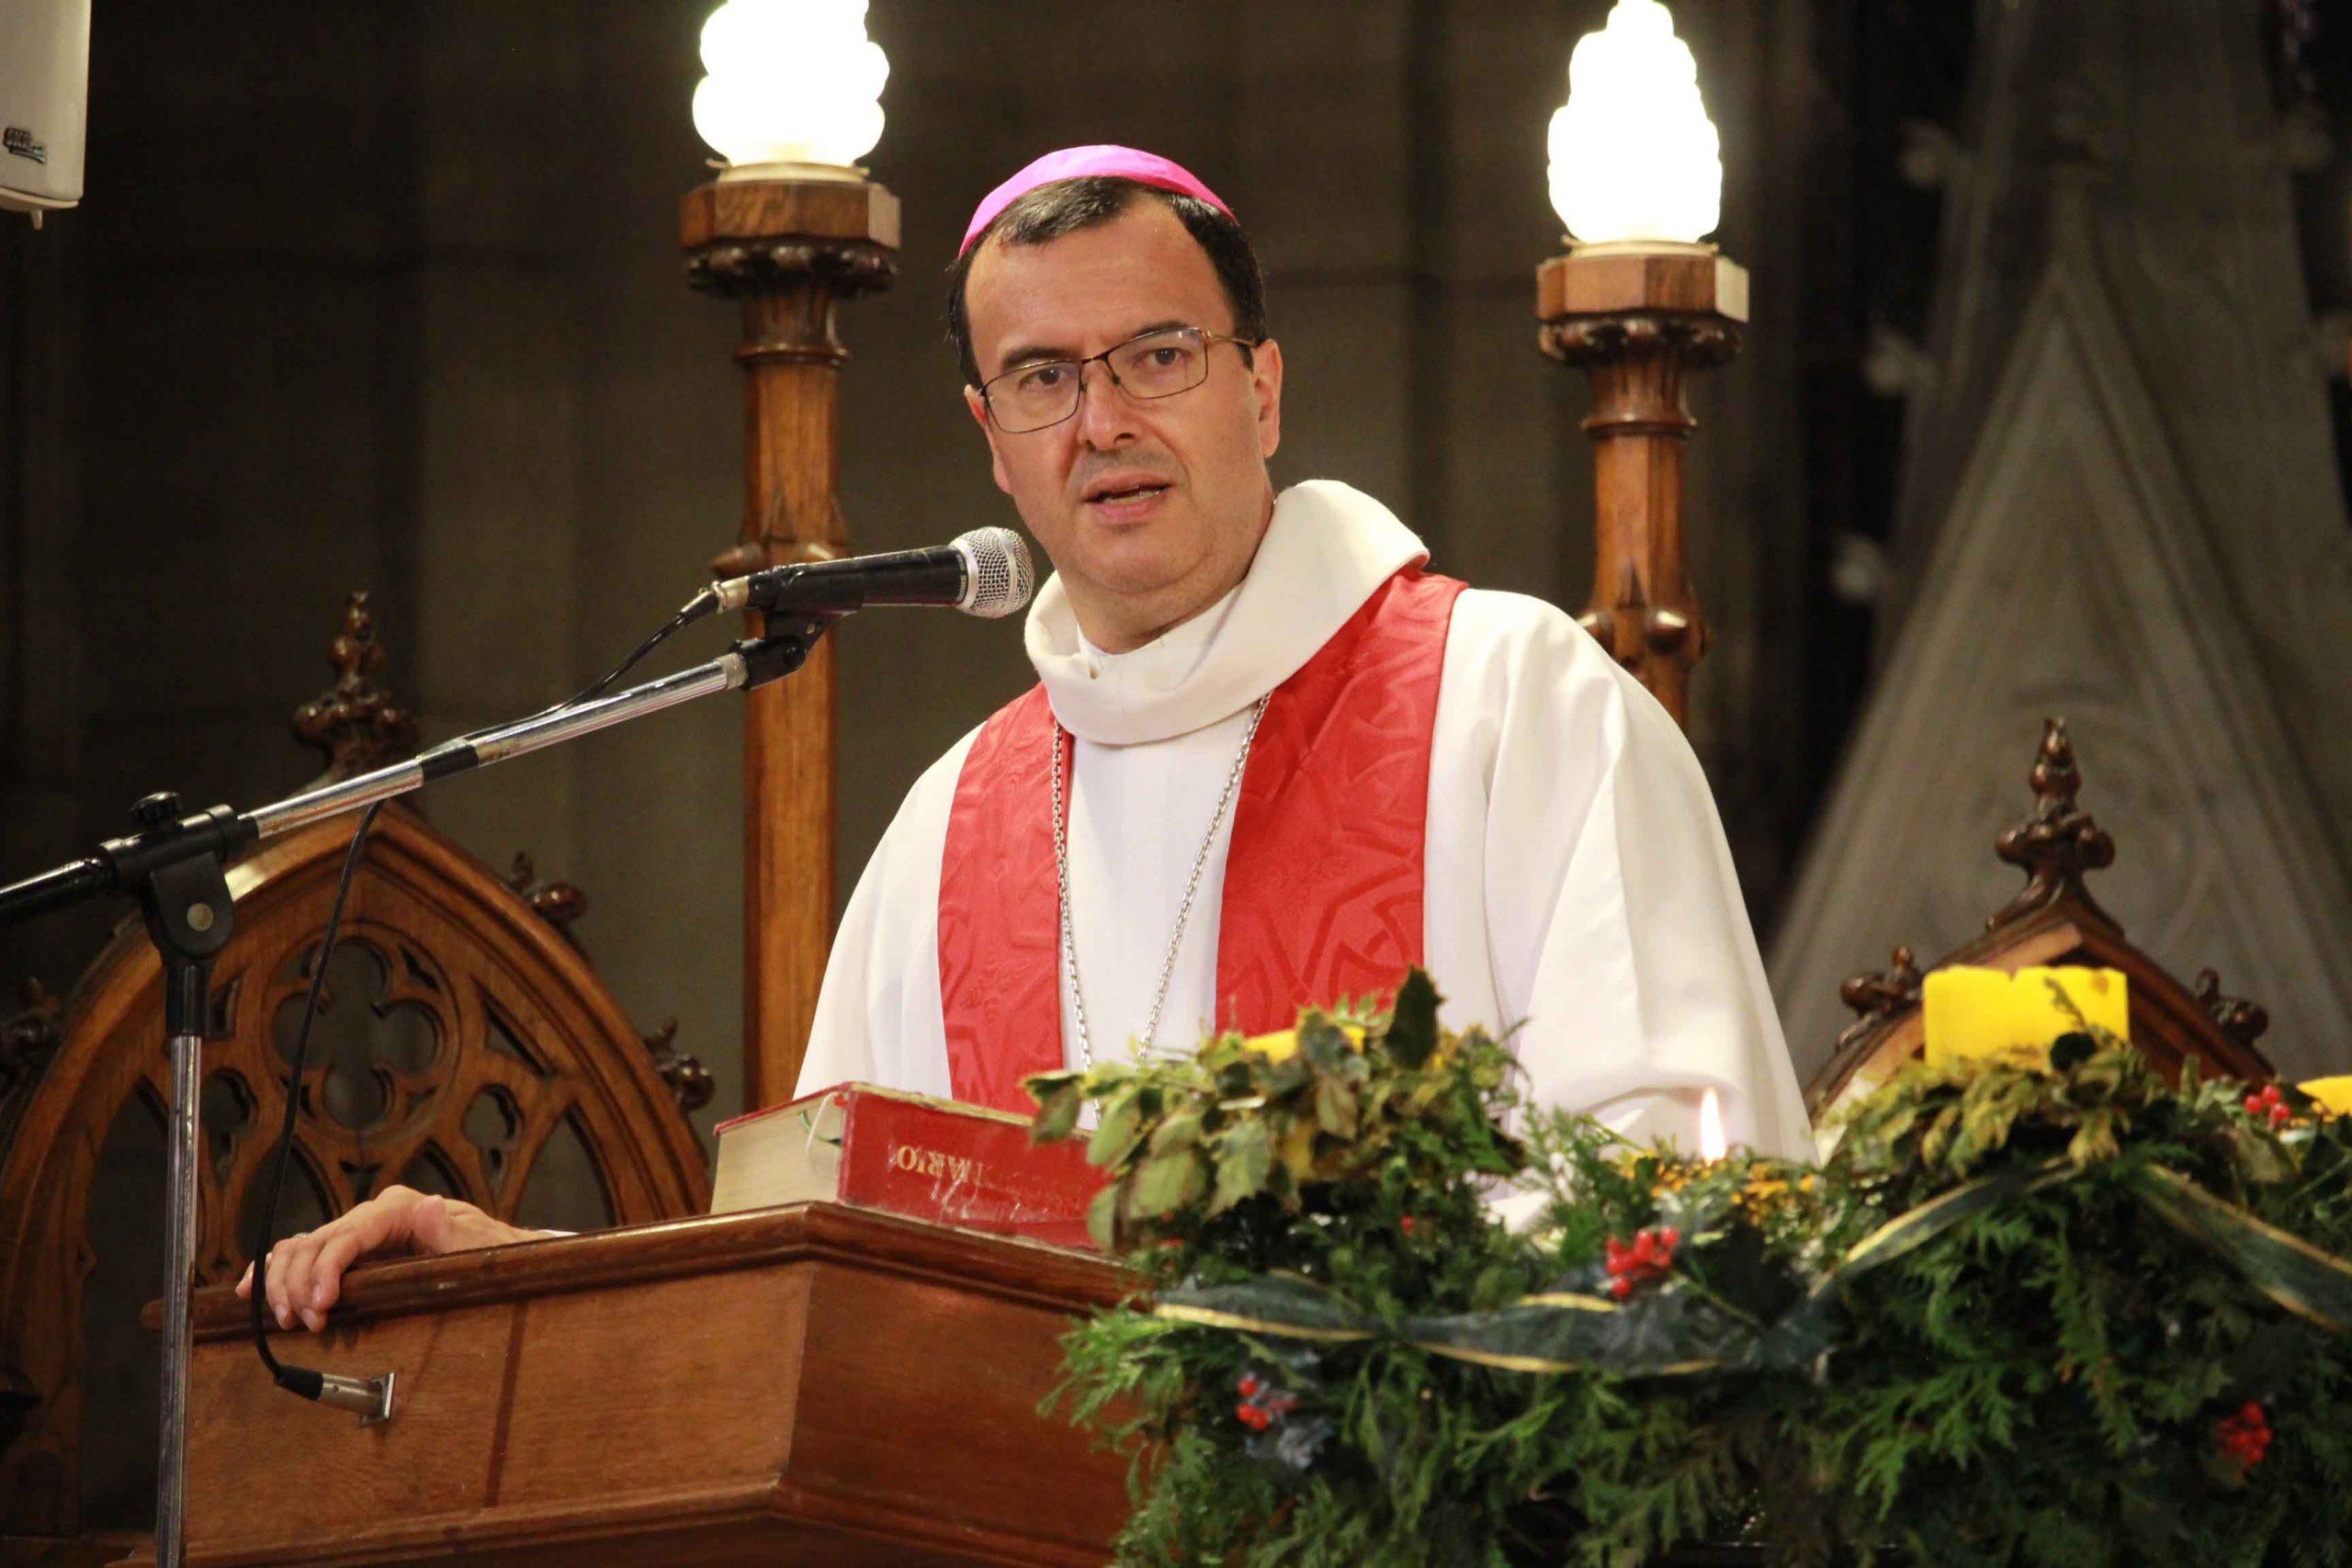 Mons. Gabriel Antonio Mestre